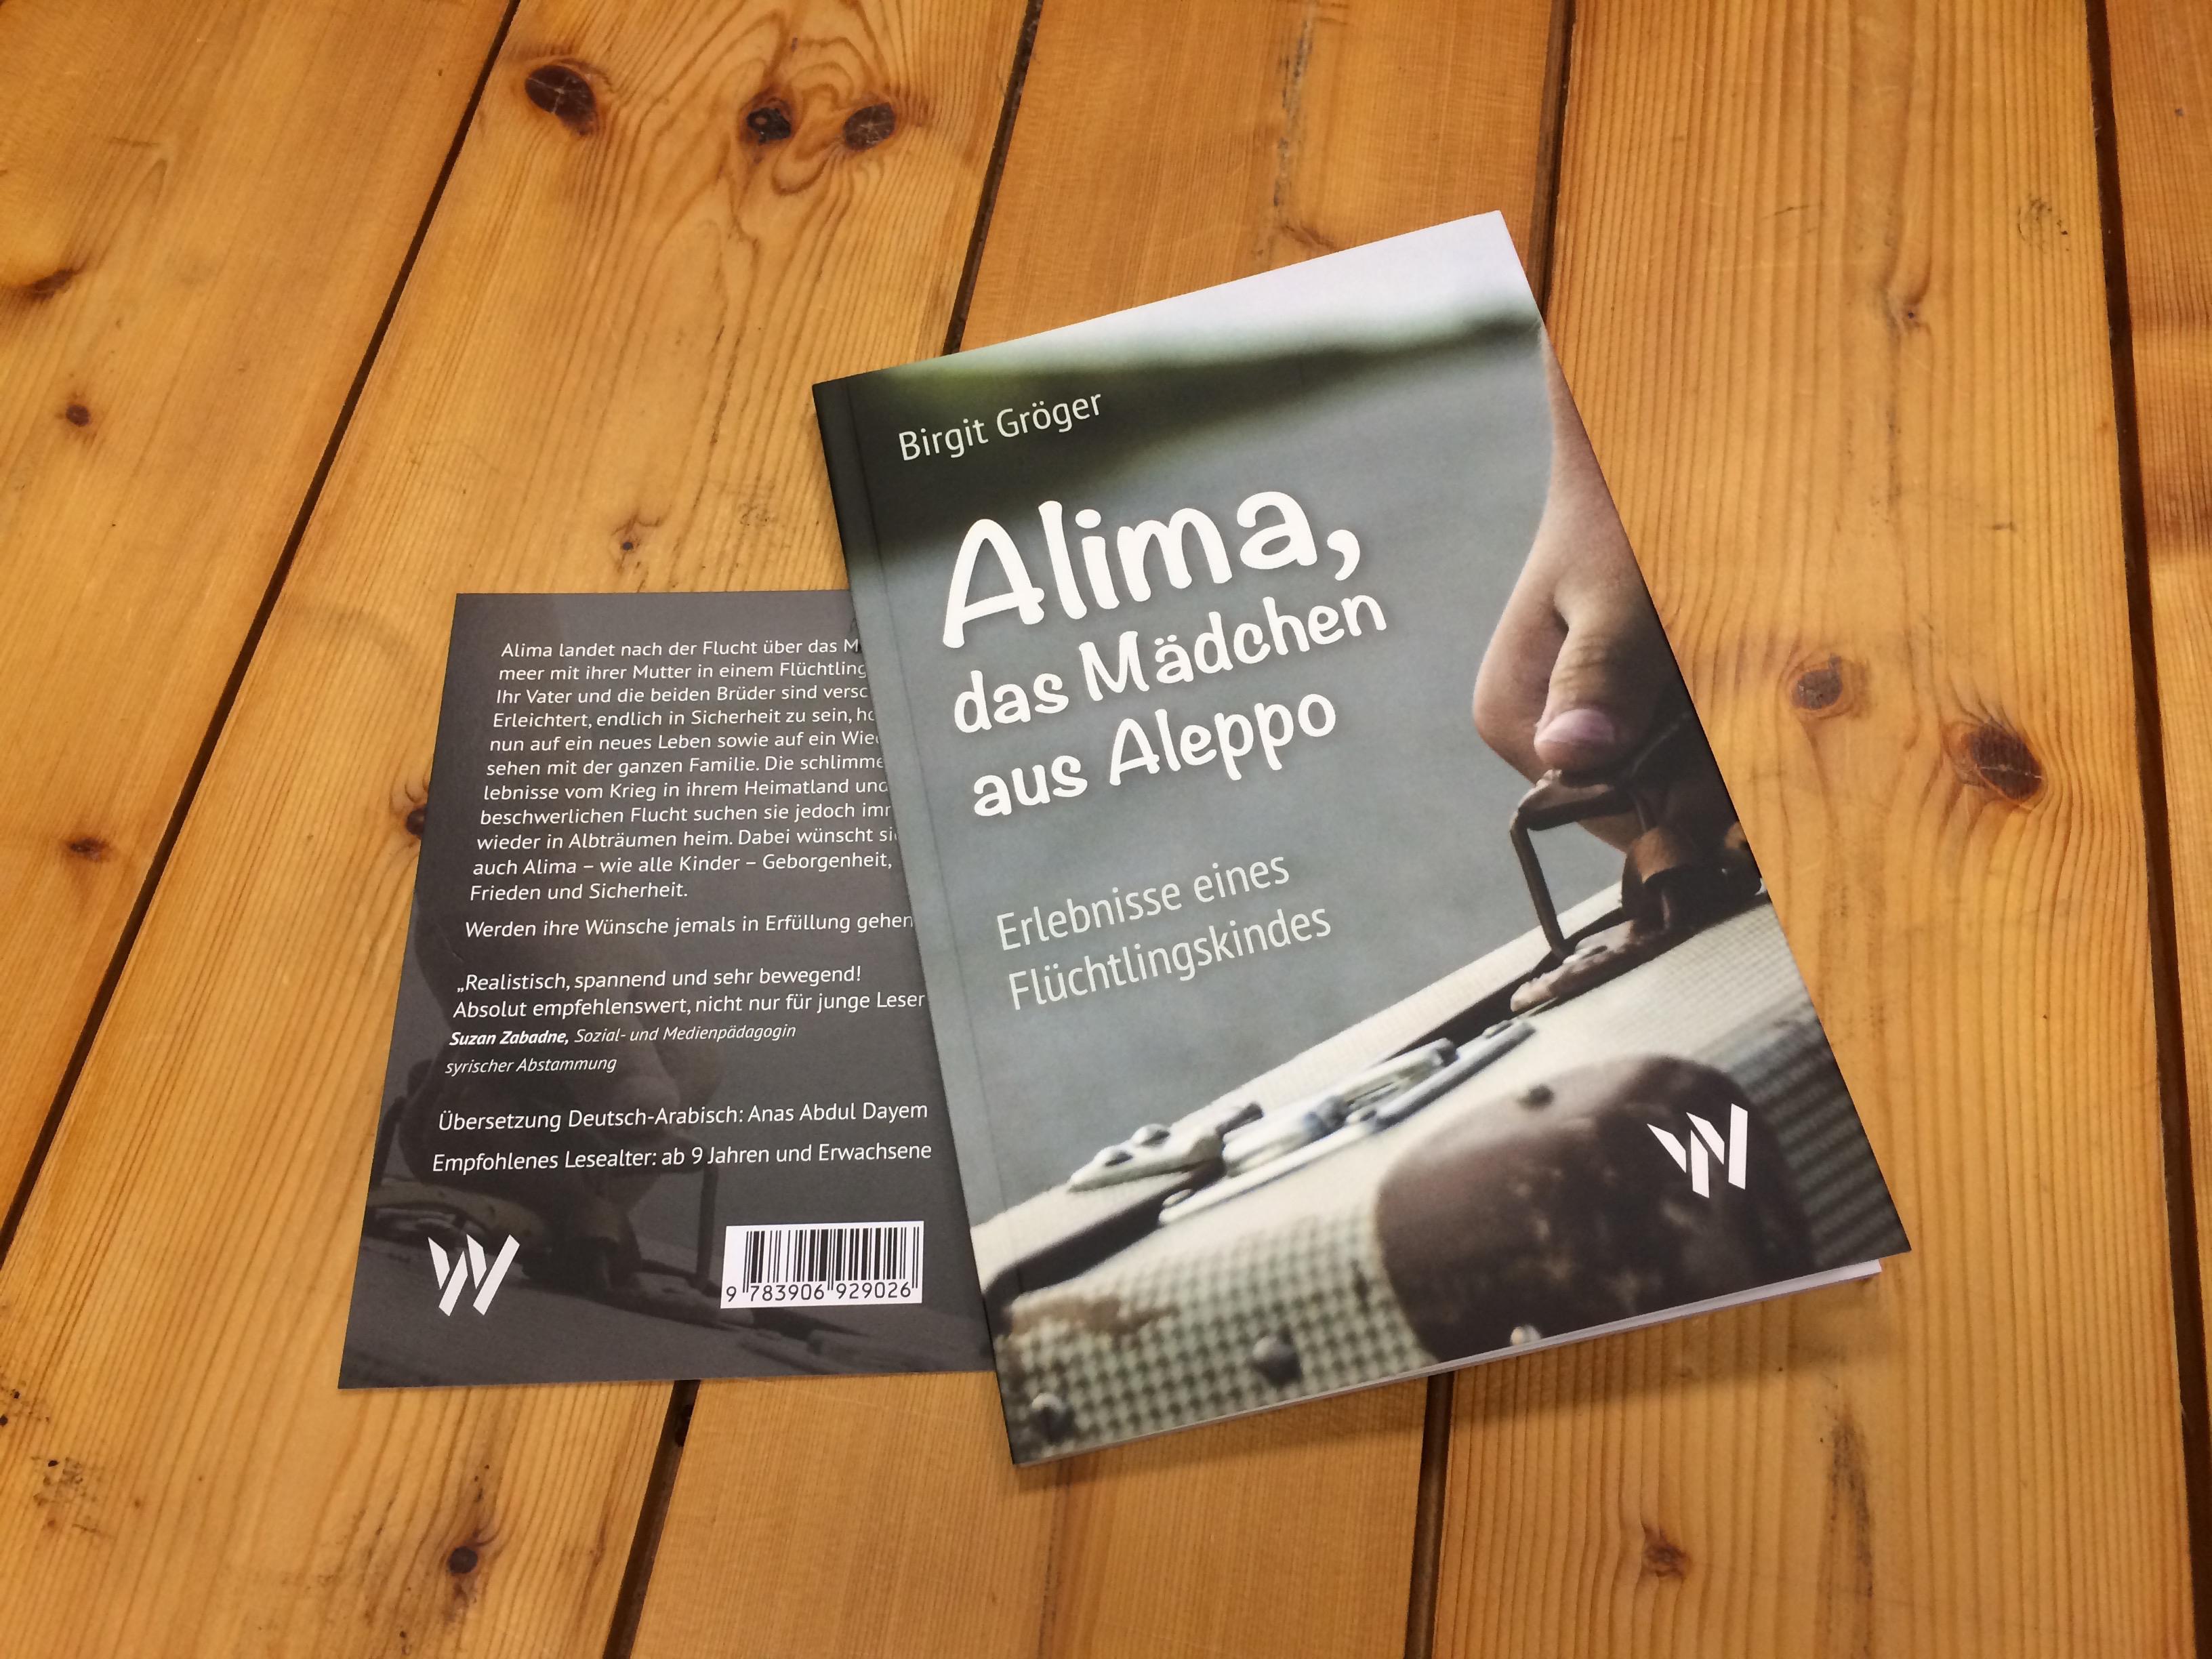 Buch_Alima-Das_Maedchen_aus_Aleppo-Cover-3